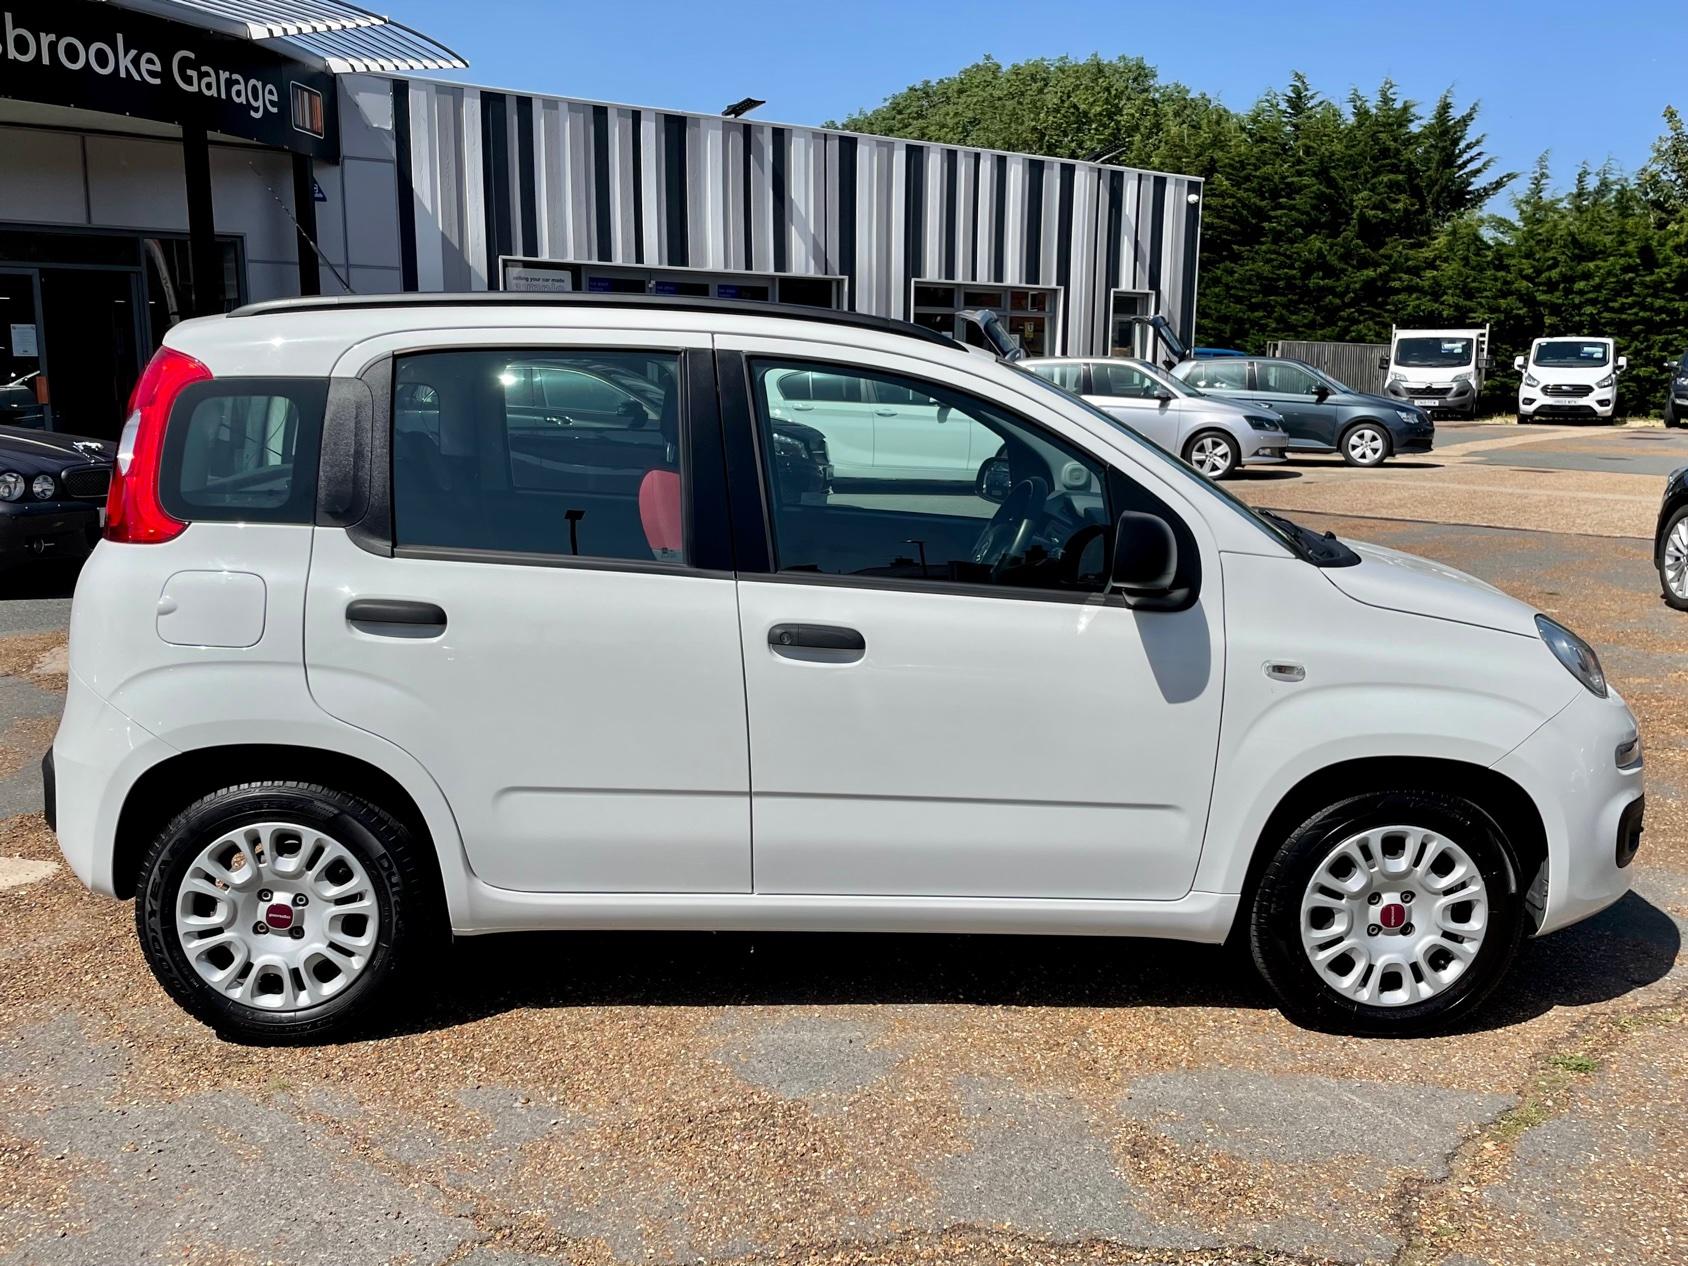 Car For Sale Fiat Panda - HK64EZV Sixers Group Image #1